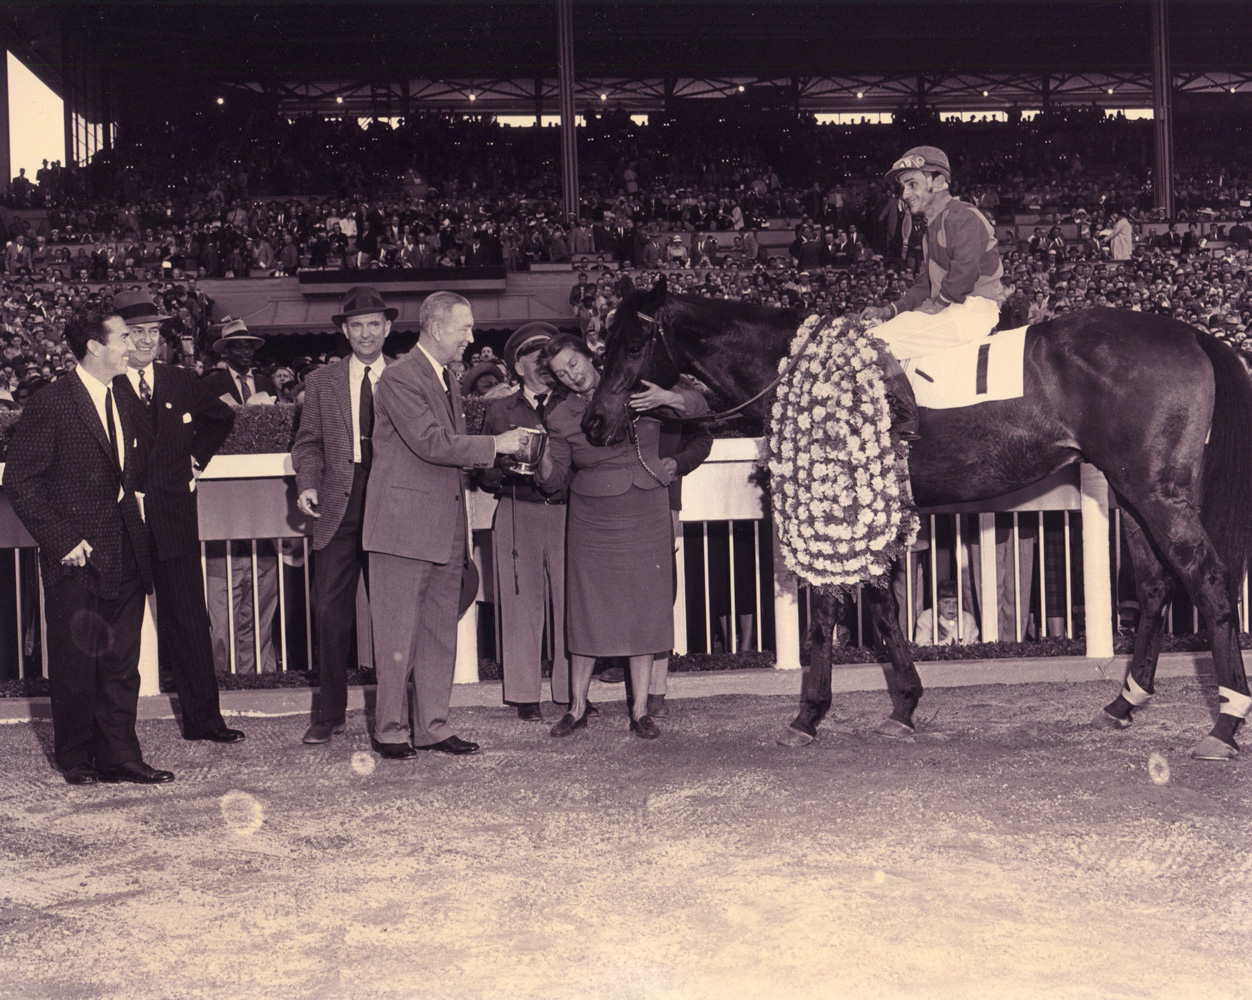 Ralph Neves and Cornhusker in the winner's circle for the 1957 Santa Anita Handicap (Santa Anita Photo/Museum Collection)